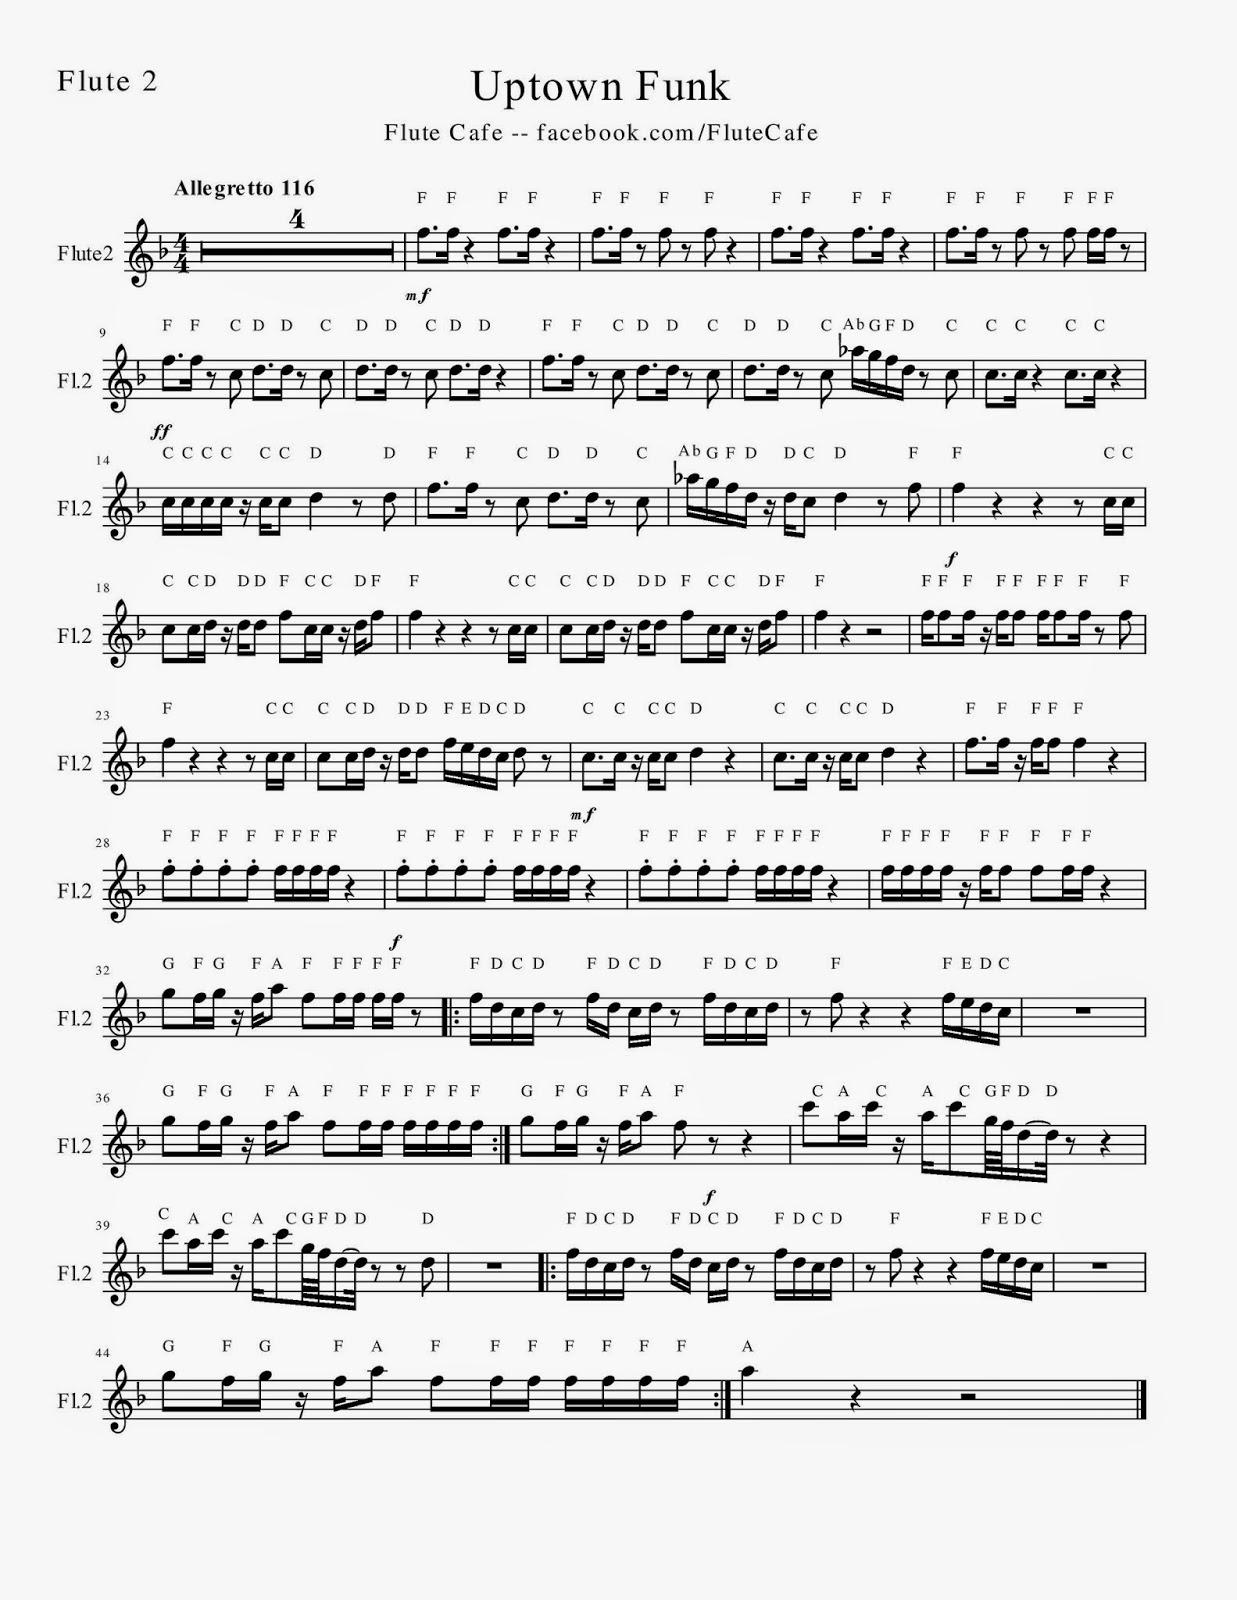 Flute cafe uptown funk flute sheet music